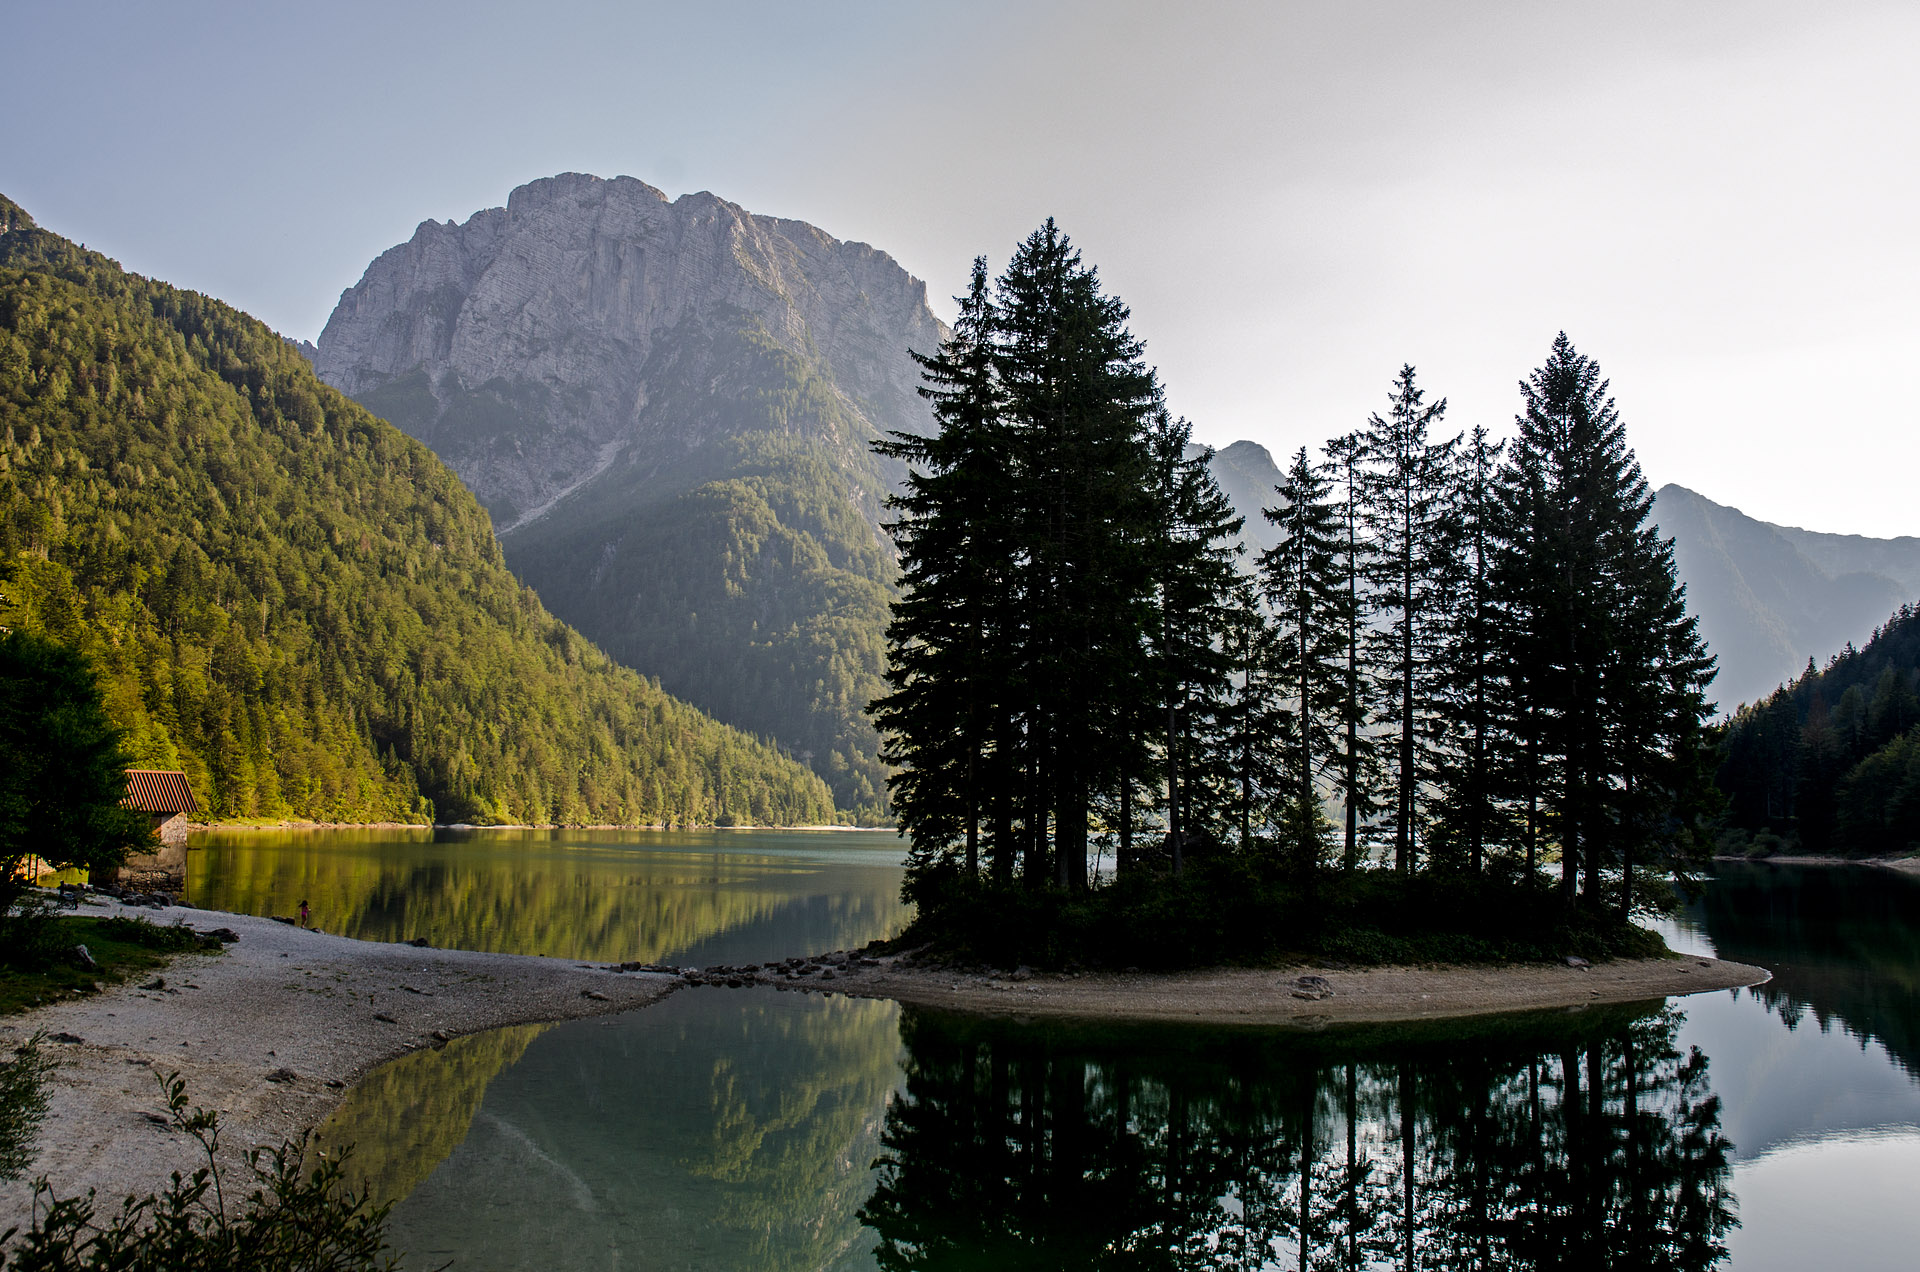 Lago del Predil (Raibl Lake)